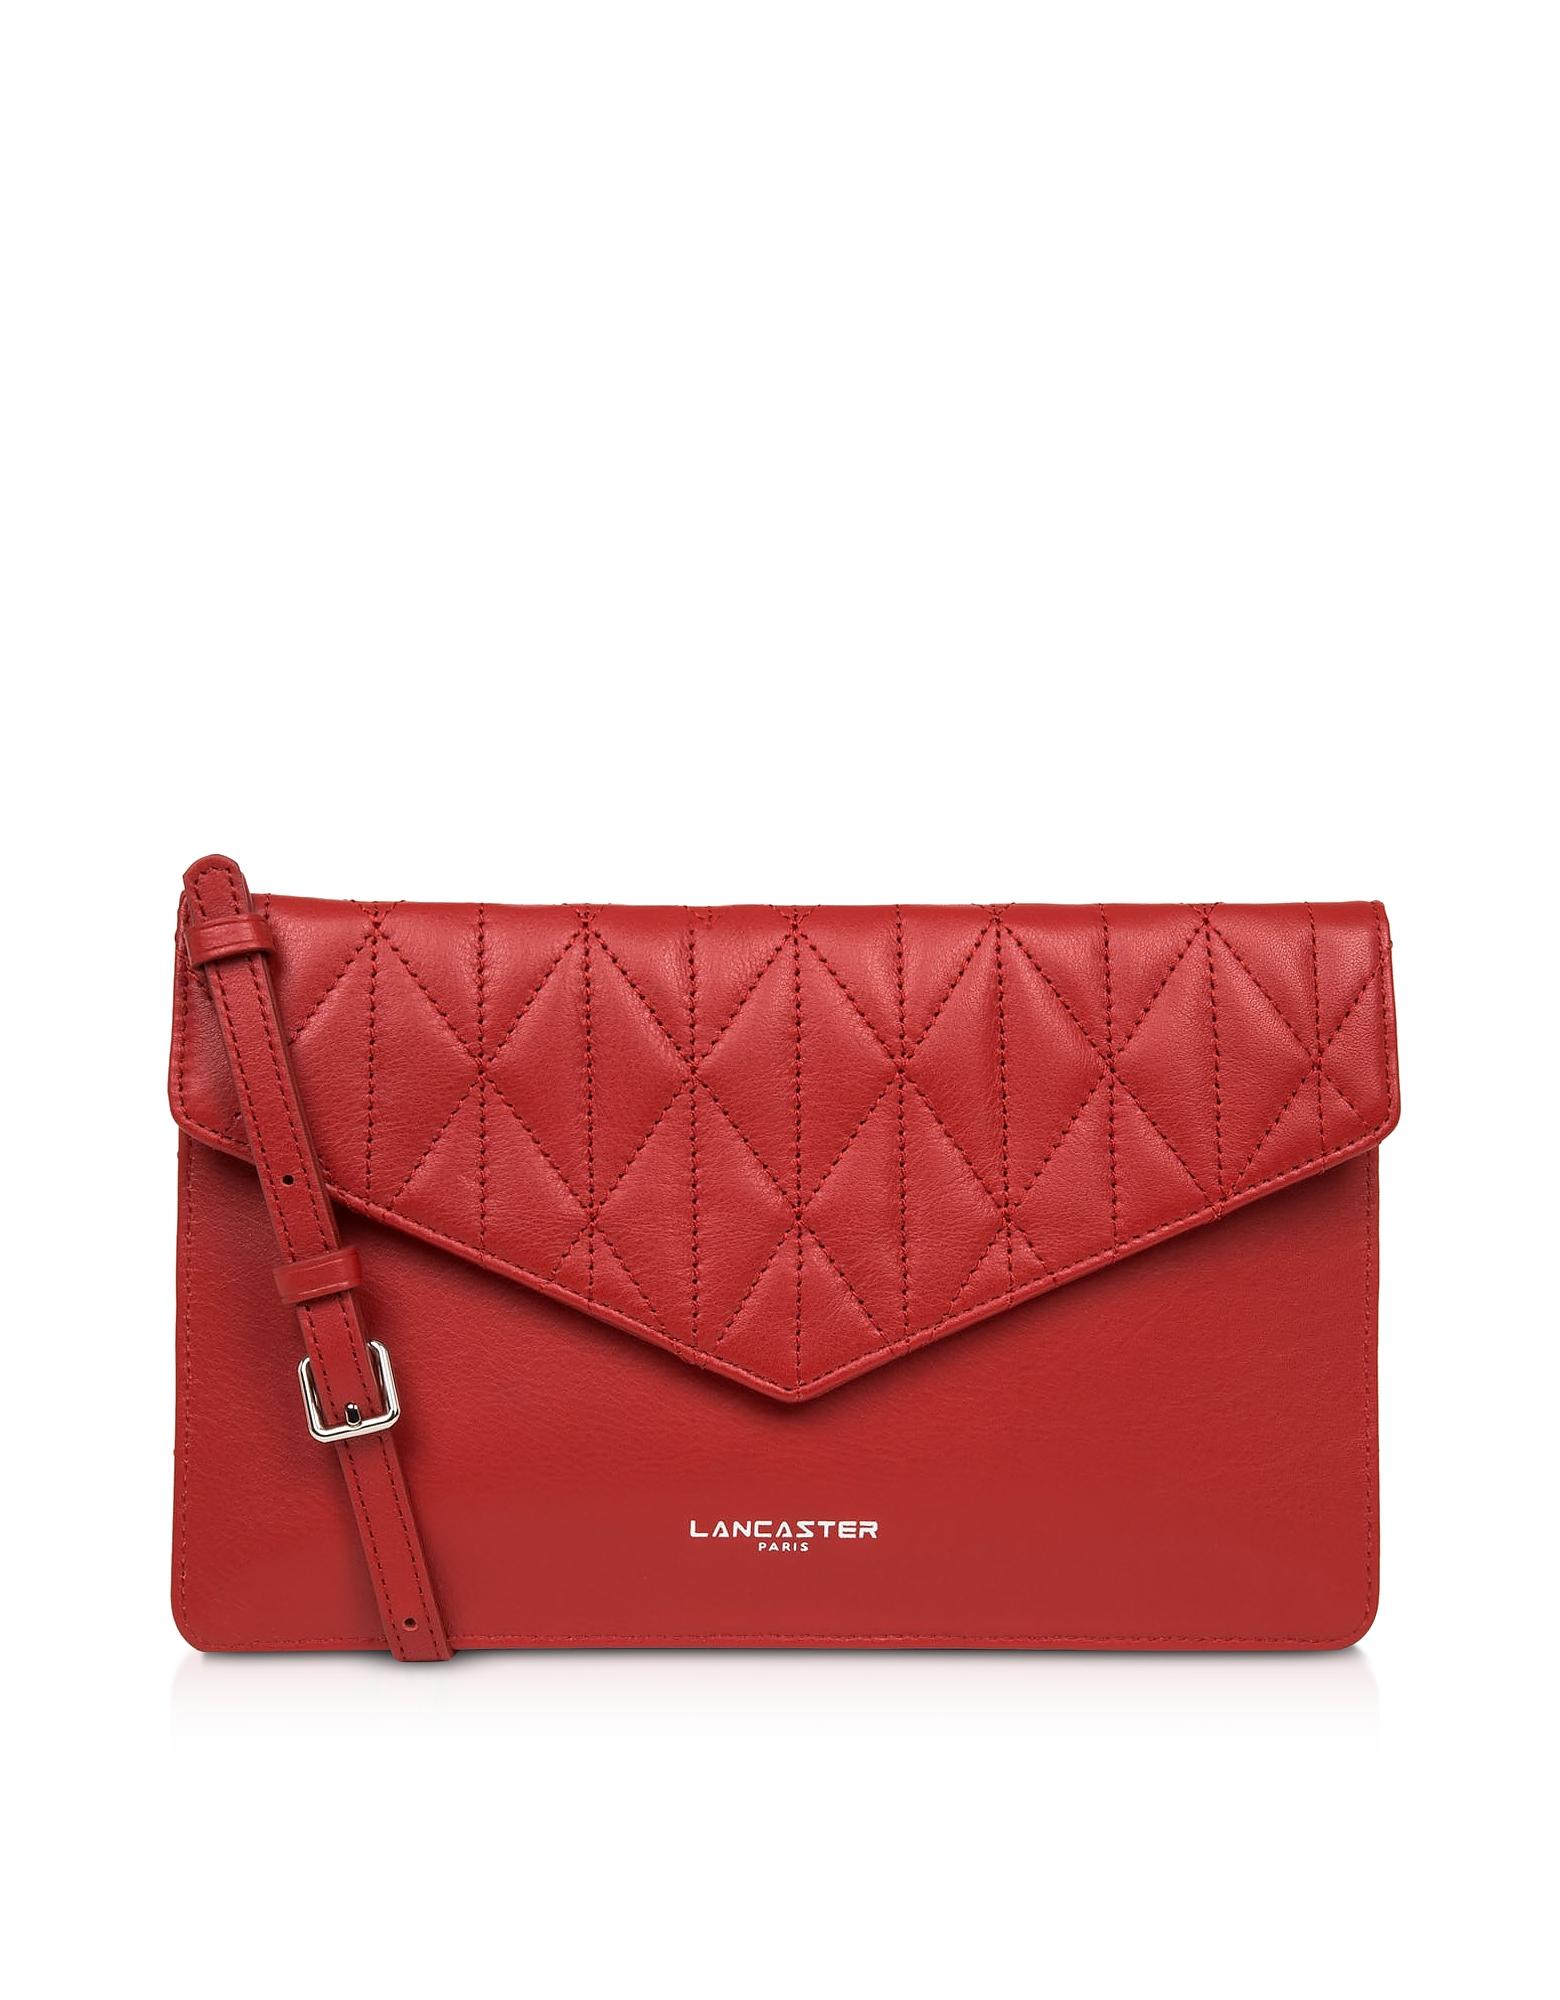 Lancaster Parisienne Matelassé Leather Clutch In Red